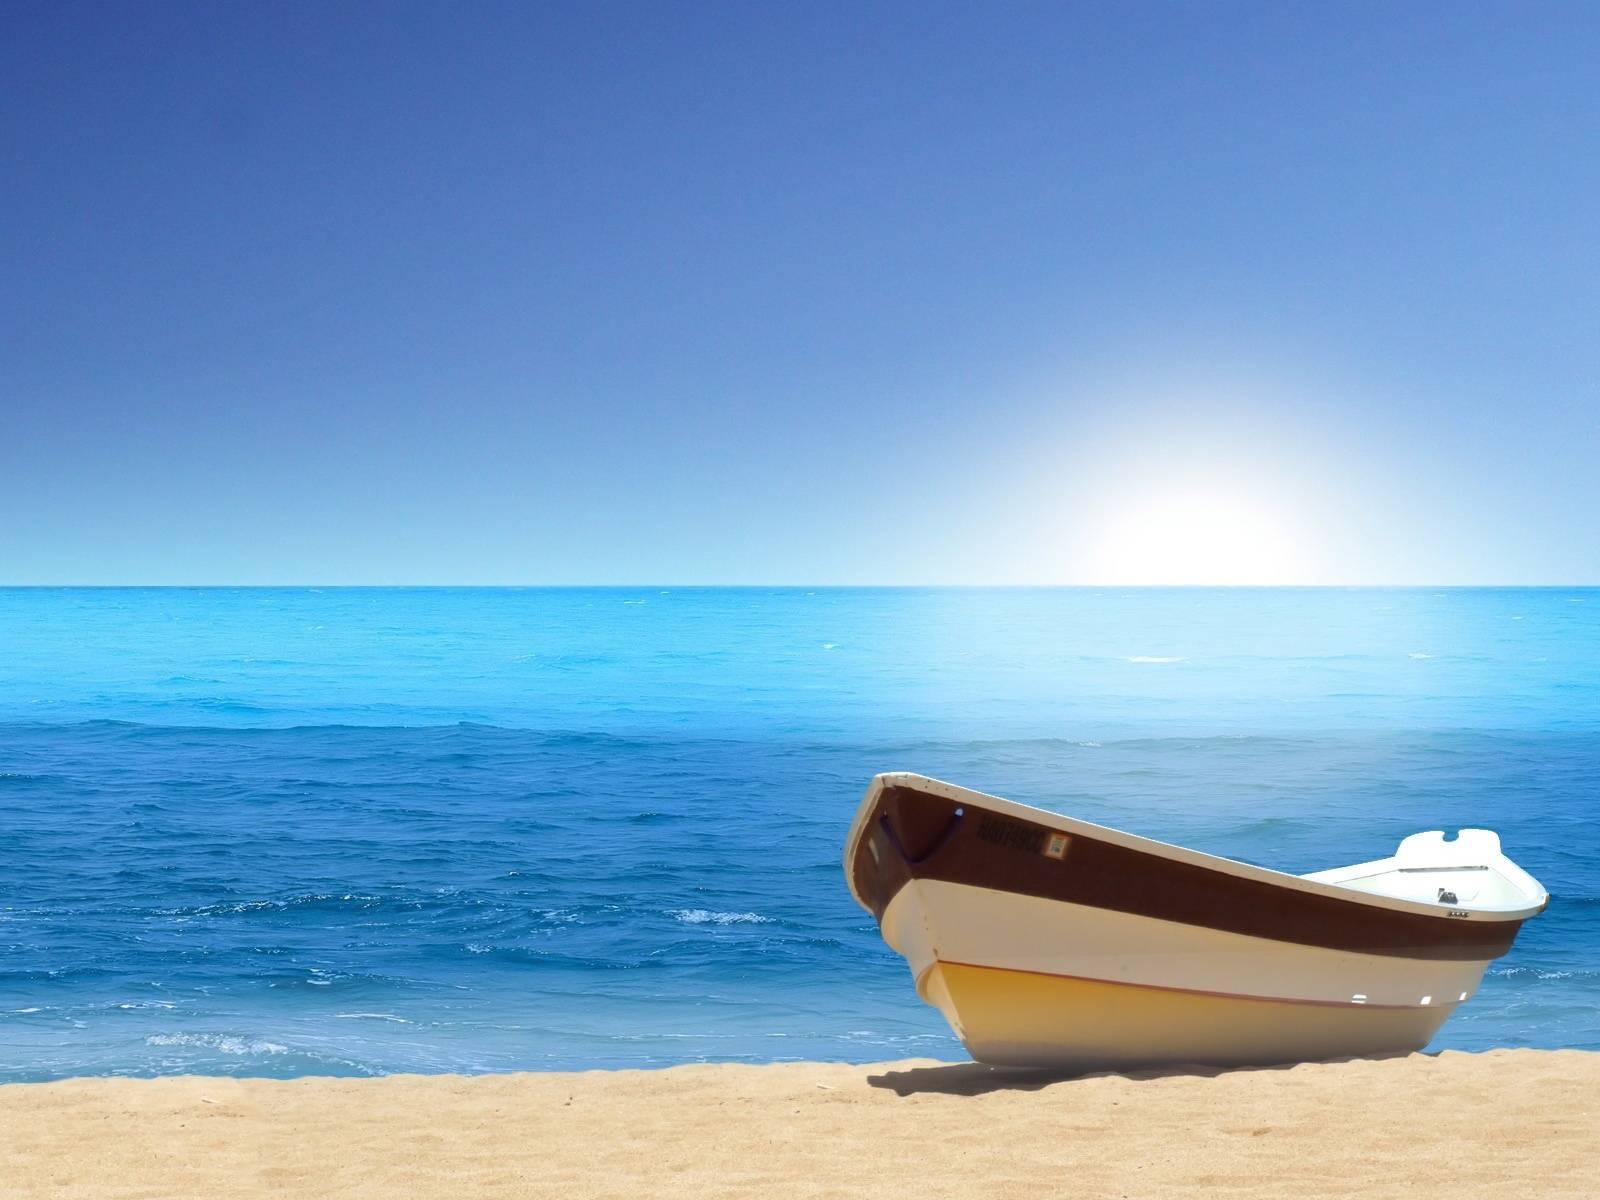 Boat Sea Beach Hd